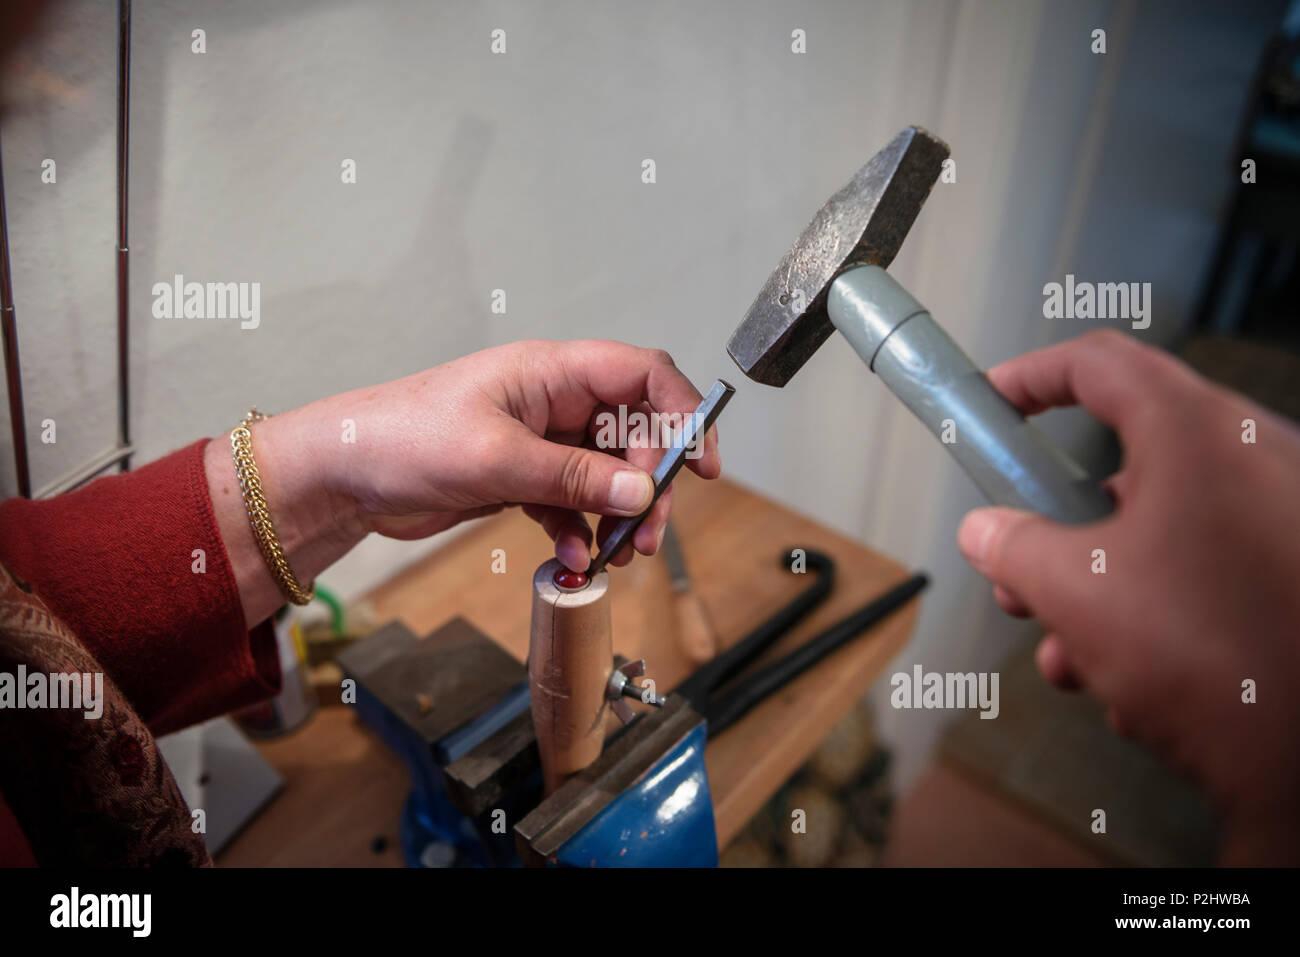 Jeweller inserting a gemstone, Vellberg, Schwaebisch Hall province, Baden-Wuerttemberg, Germany - Stock Image